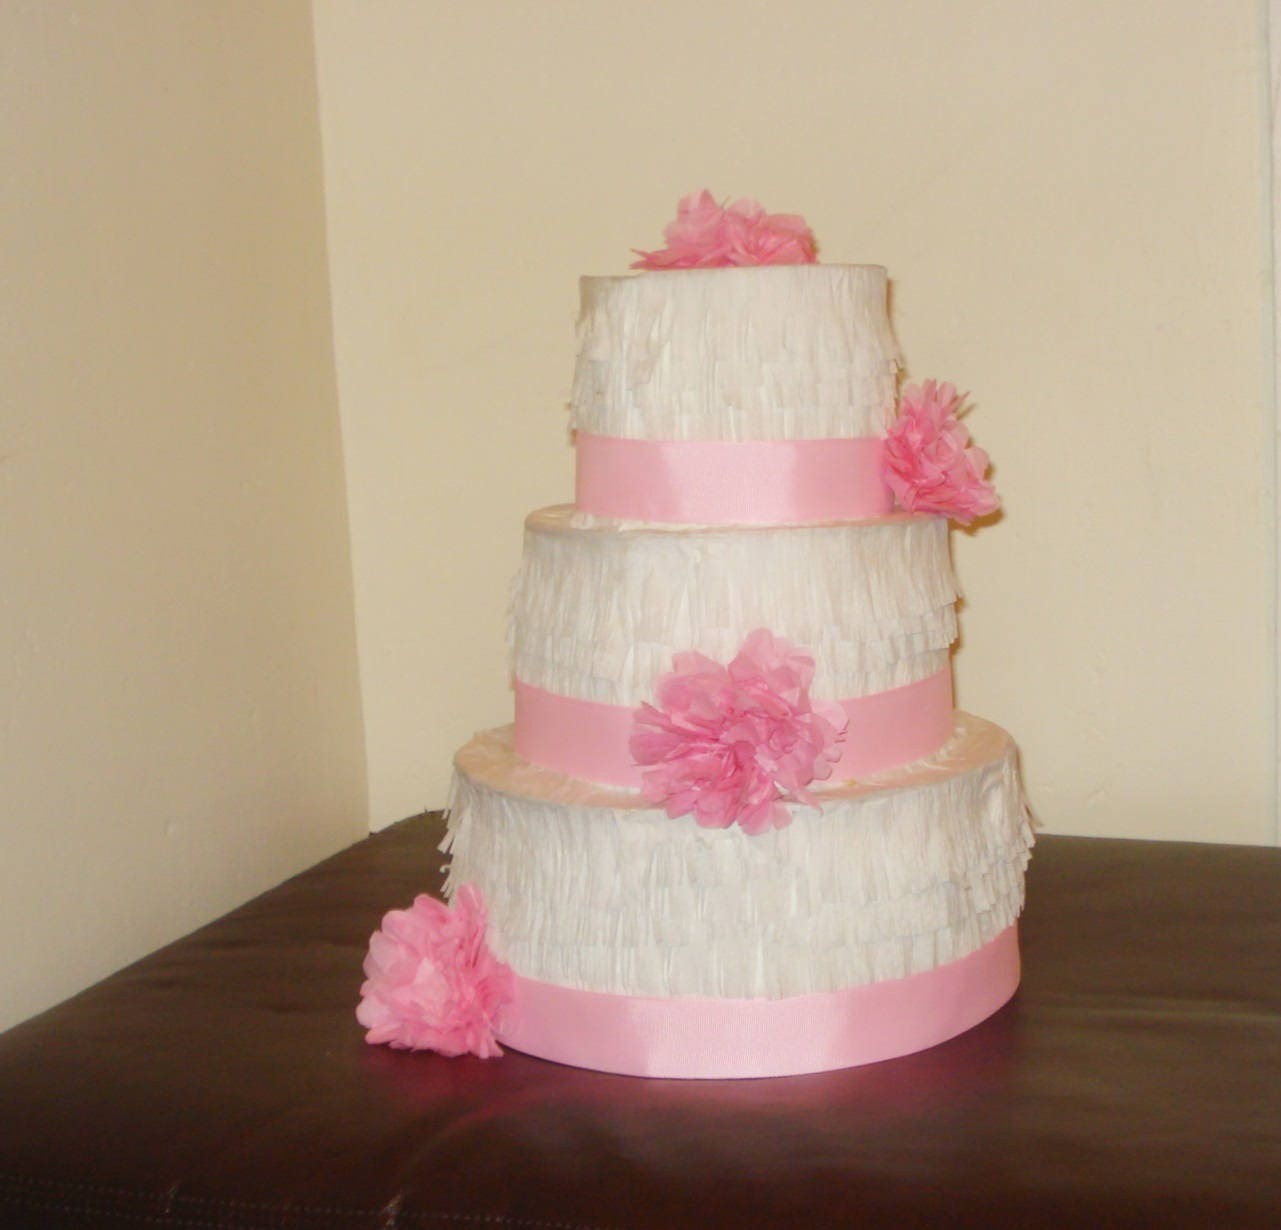 Astonishing Light Pink Wedding Cake Pinata Birthday Cake Pinata Etsy Funny Birthday Cards Online Alyptdamsfinfo